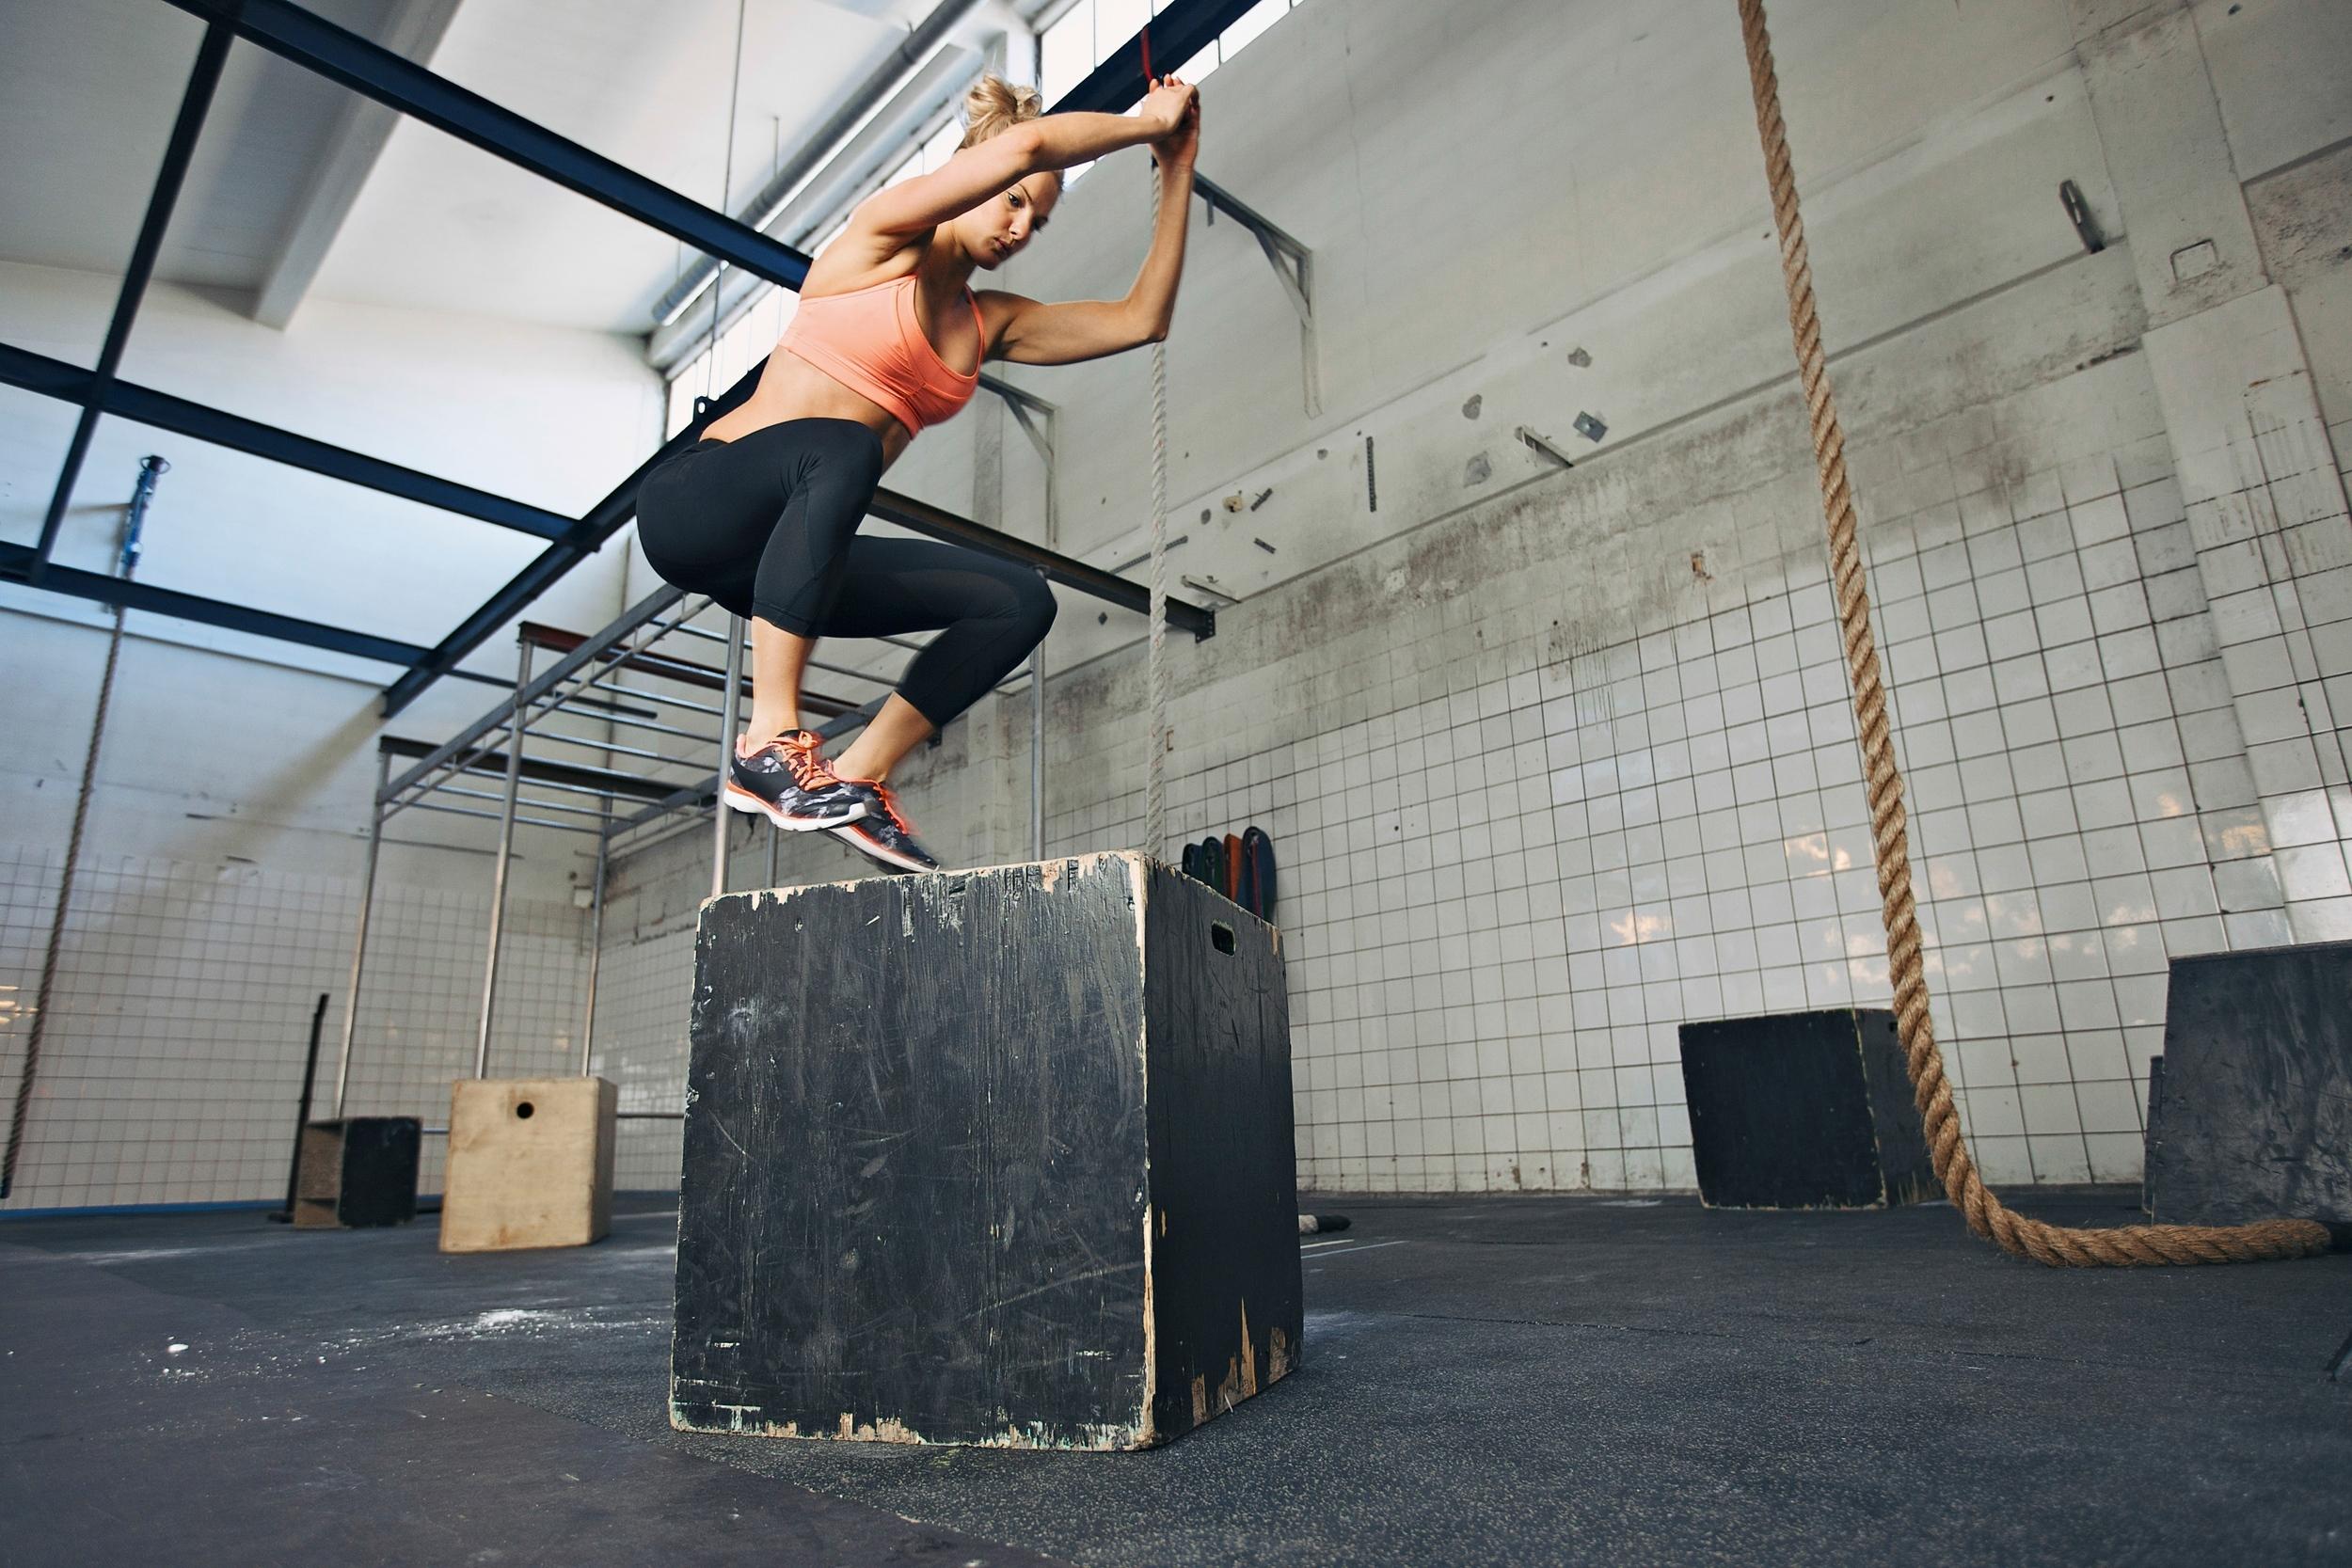 hunter bennett performance box jumps